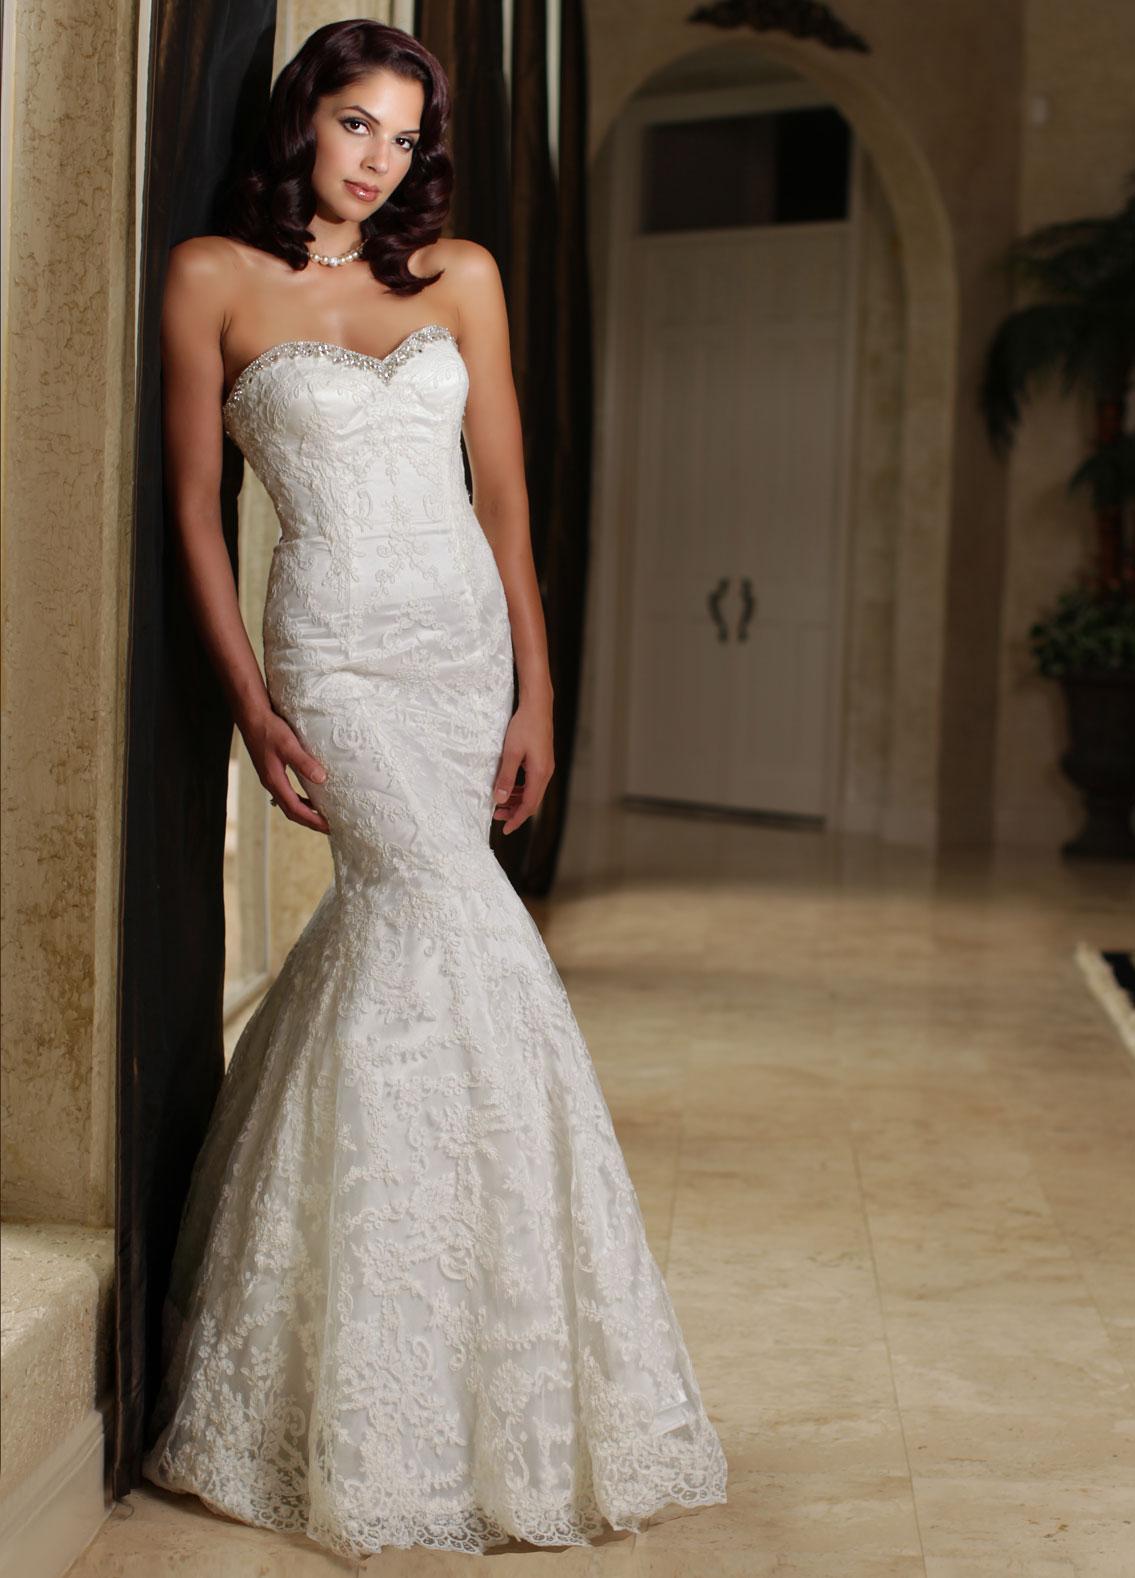 davinci-bridal-gown-06.jpg